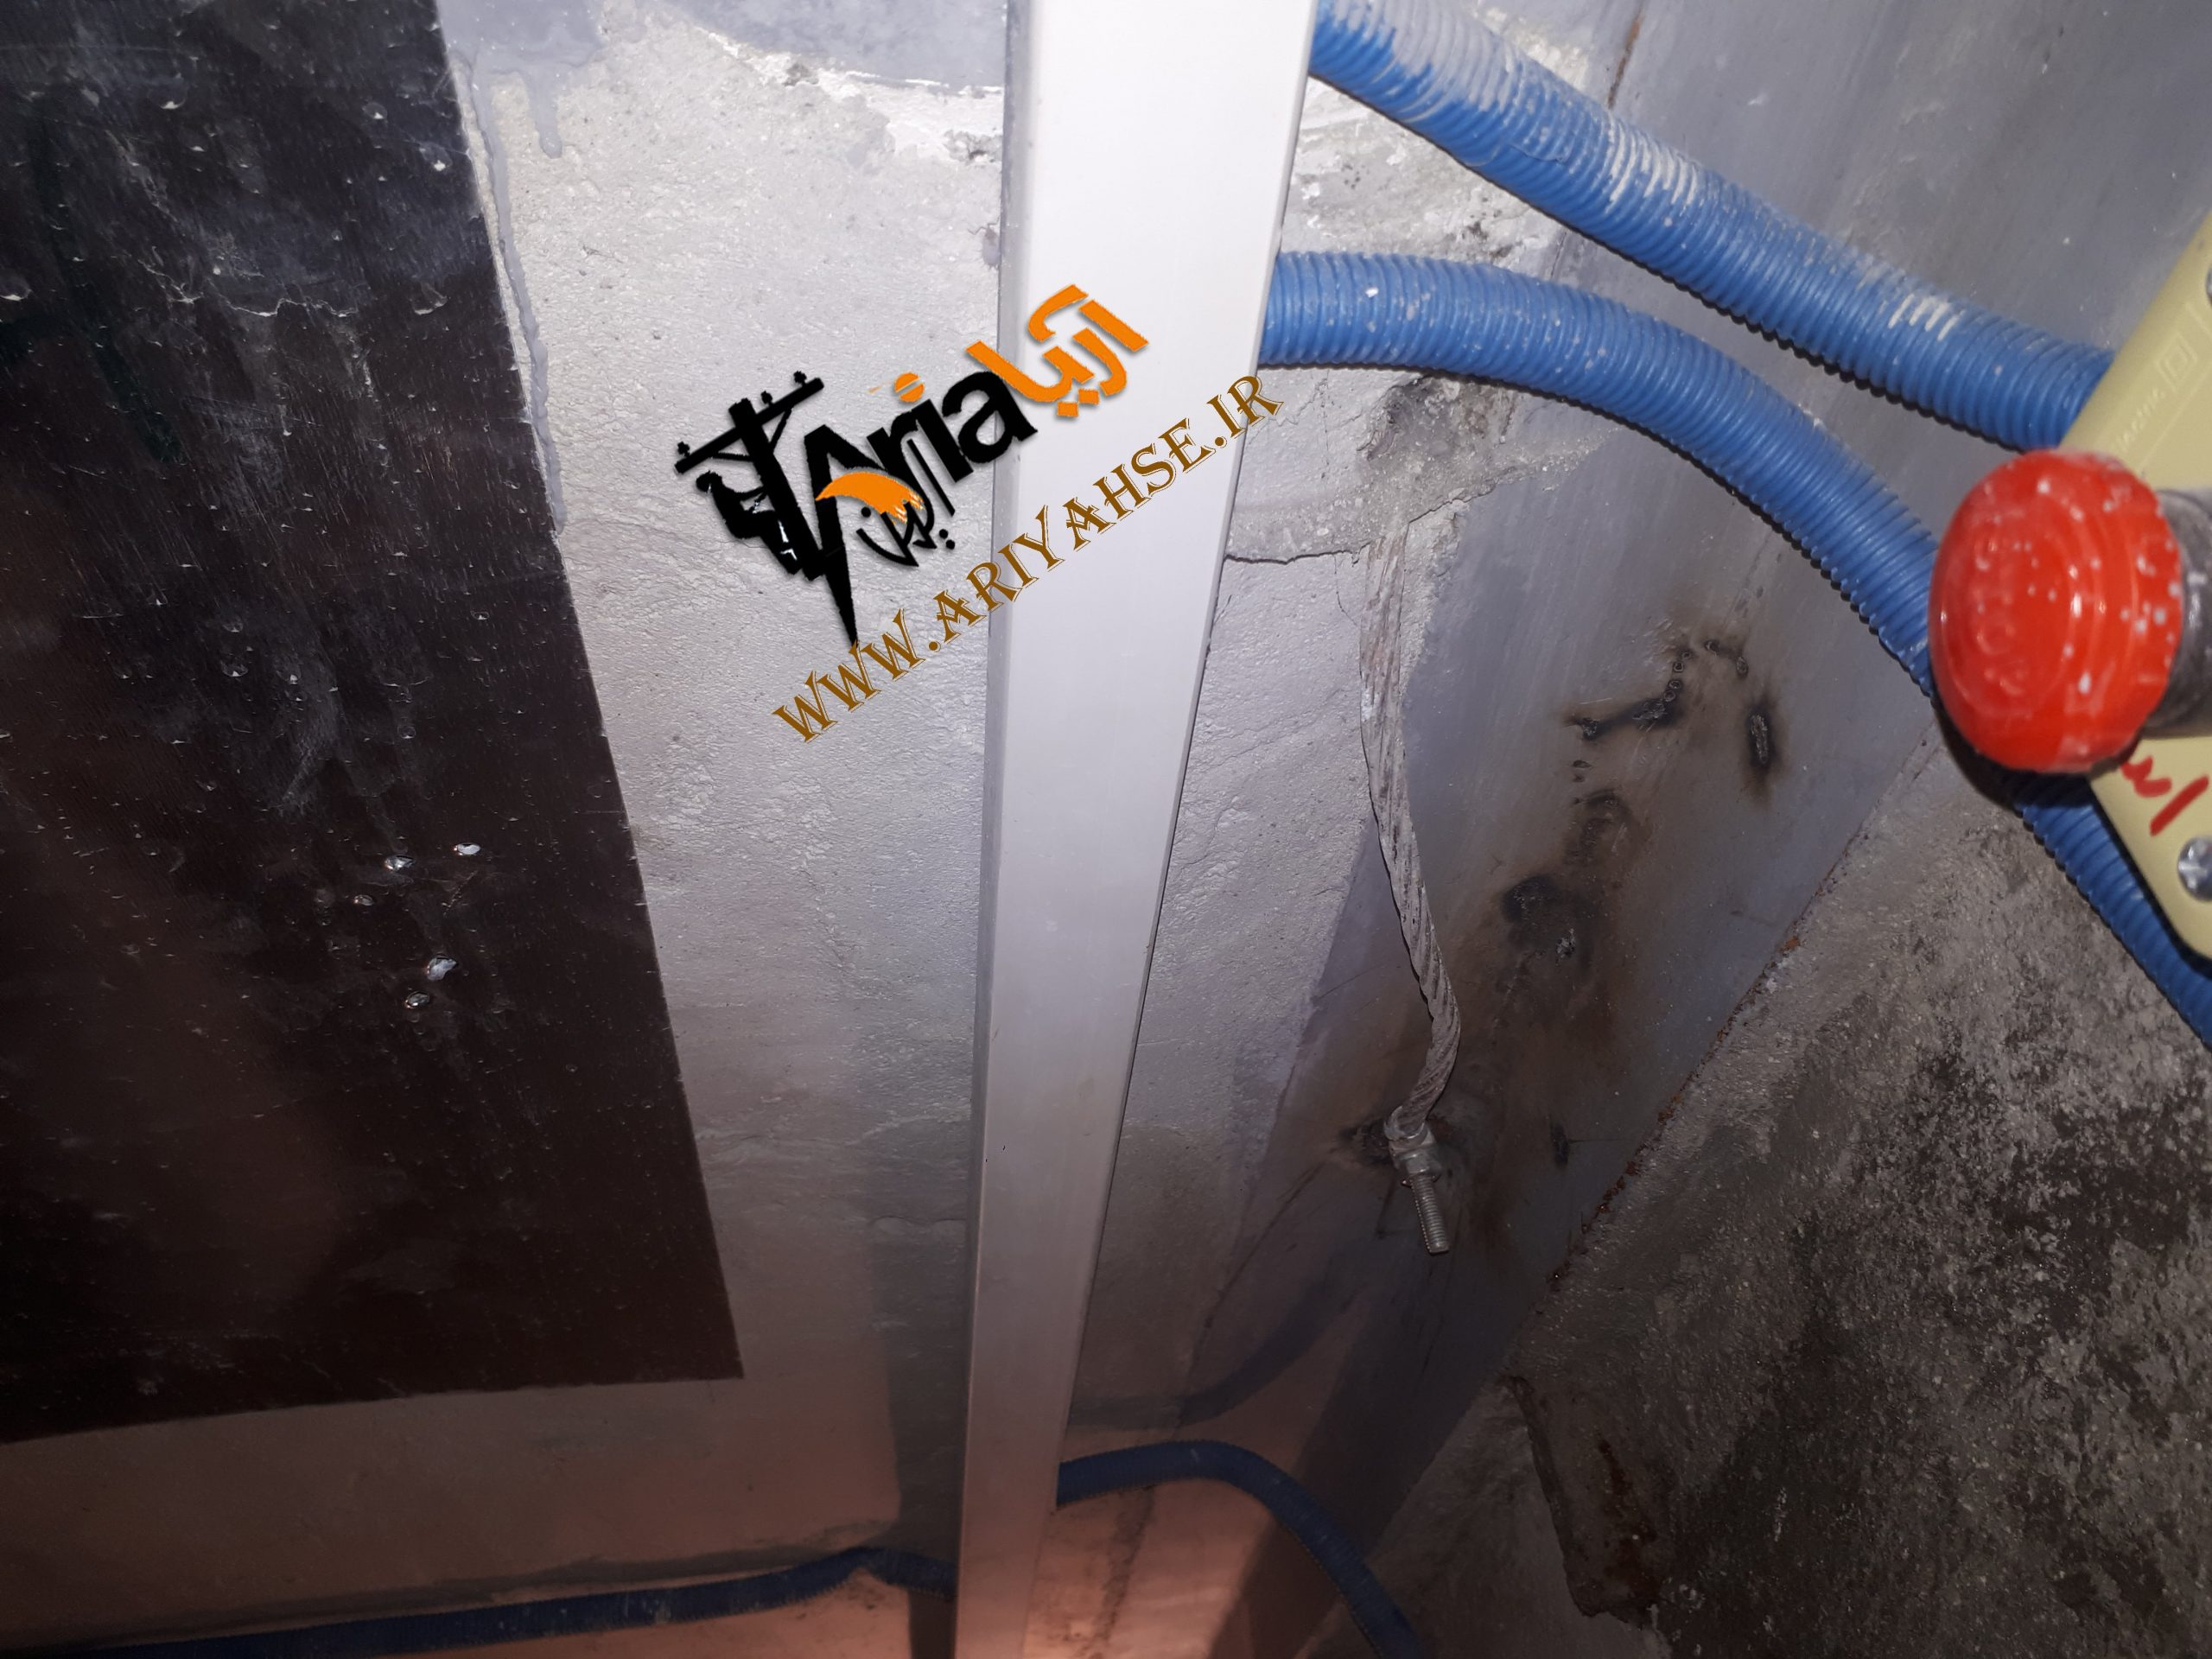 اتصال آسانسور به چاه ارت